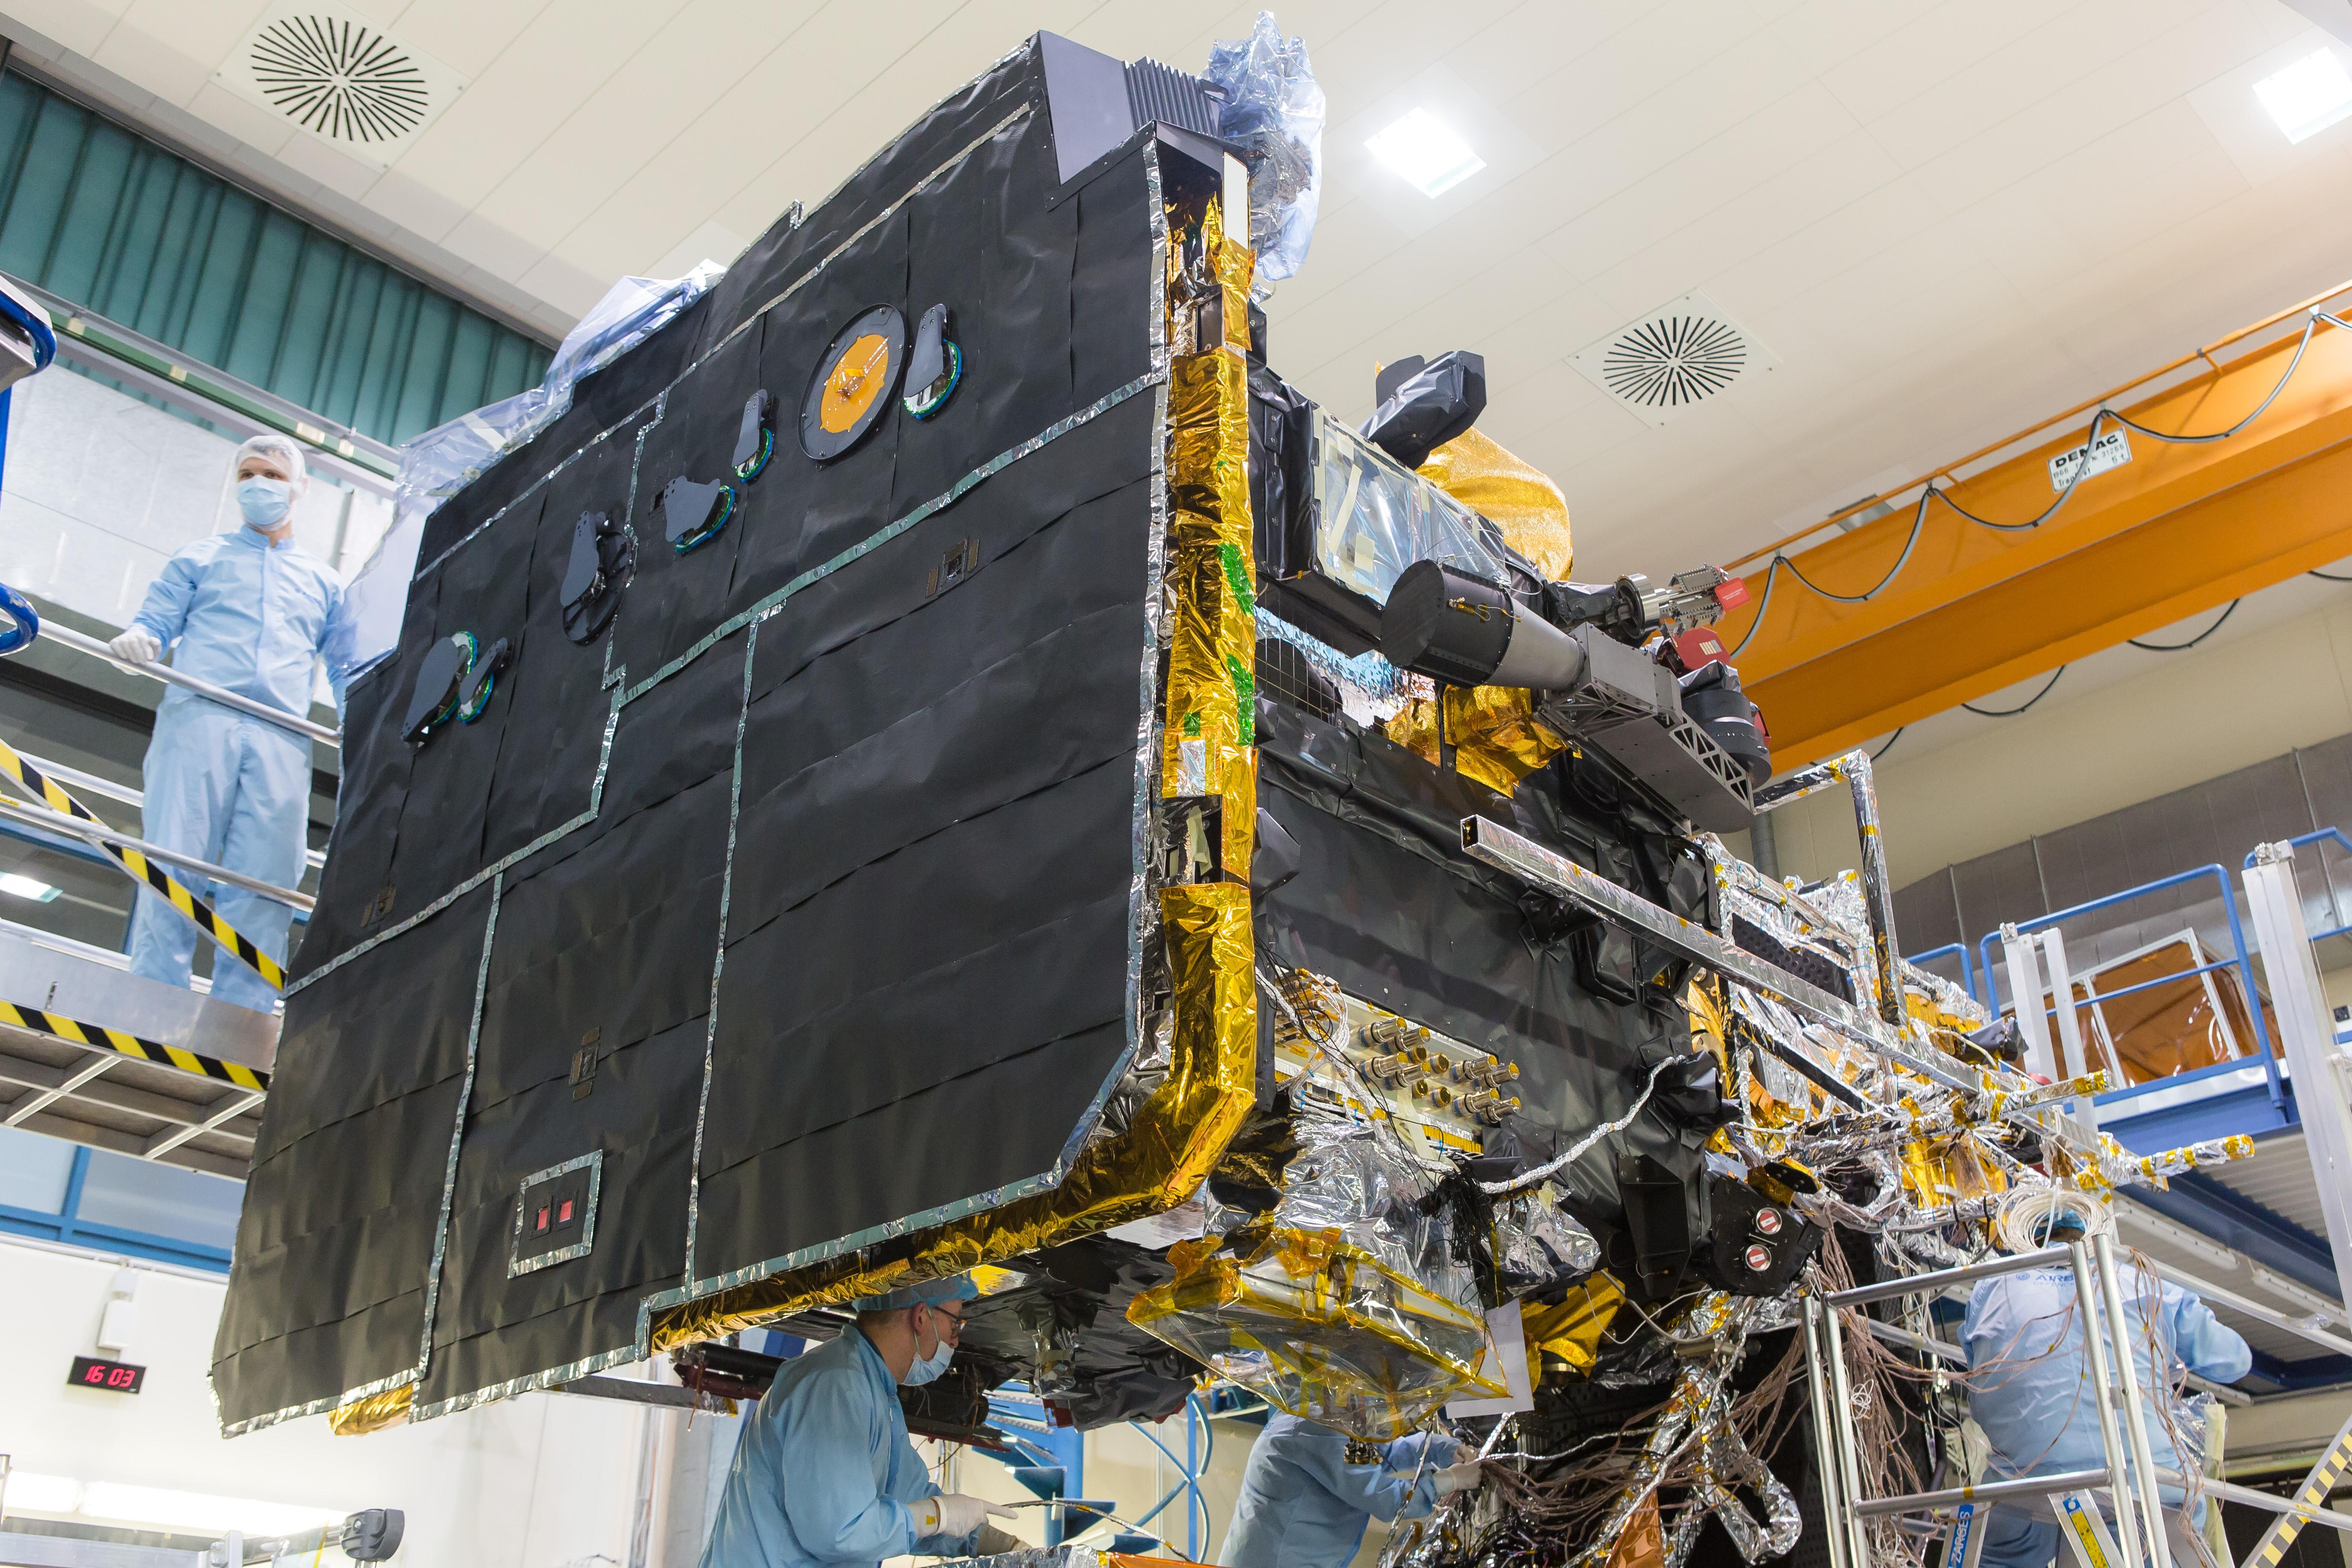 1567214098483-Solar_Orbiter_with_MLI_and_heat_shield_20181122_1.jpg